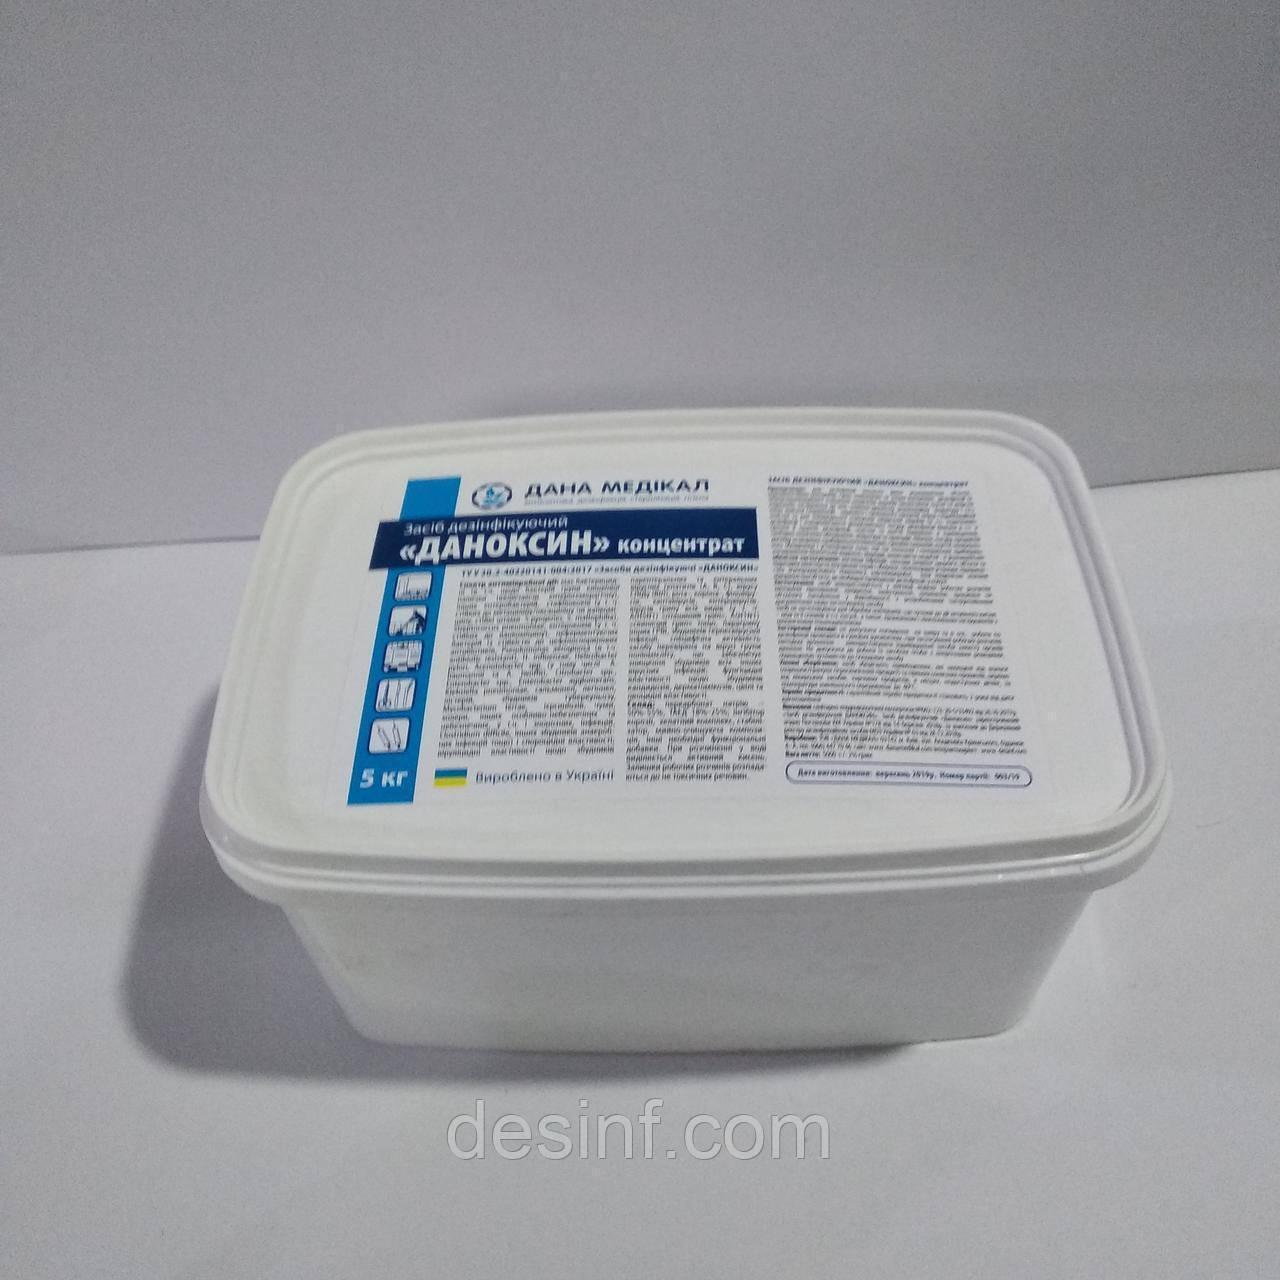 Даноксин (з комплексом ензимів), 5 кг (5 пакетиків по 1 кг) + доз.ложка.